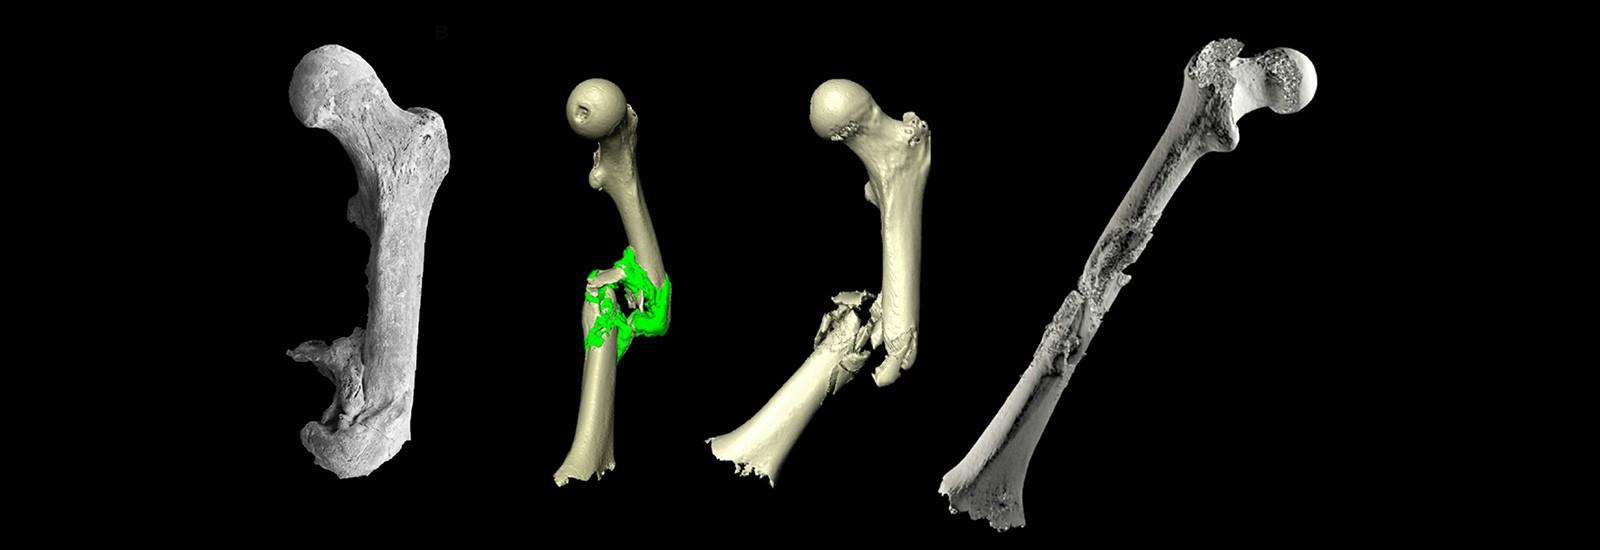 Pacea transfert impression 3d archeologie osteologie